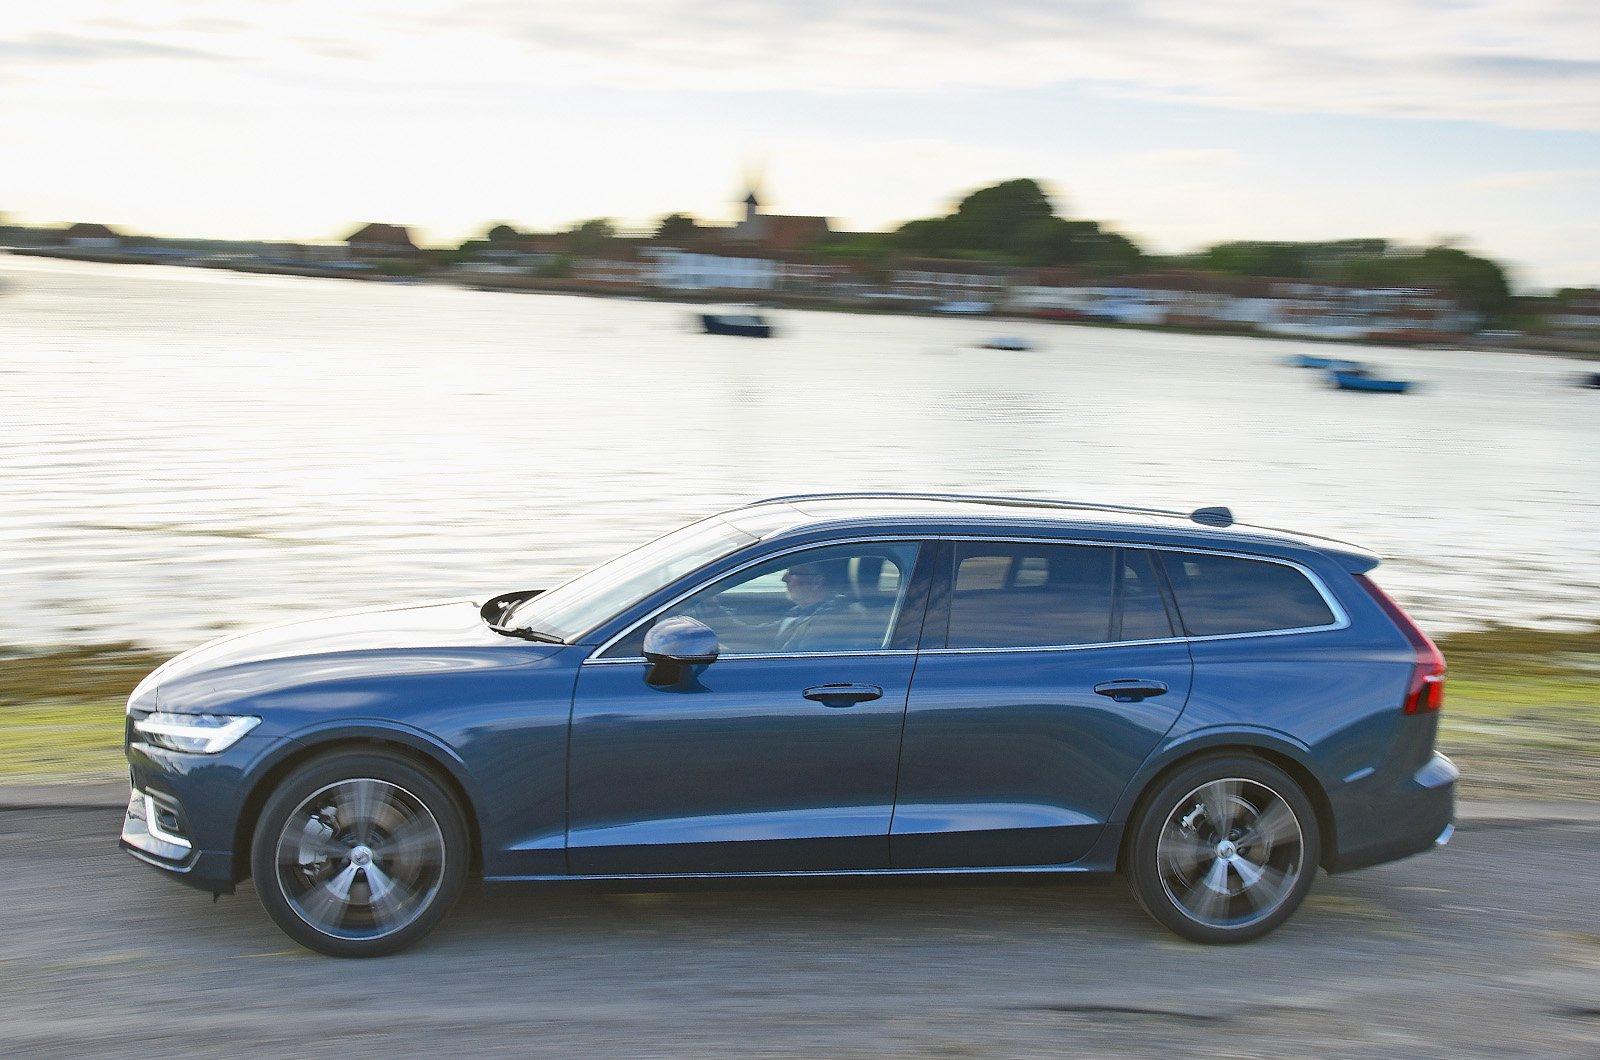 Used Volvo V60 2018 - present